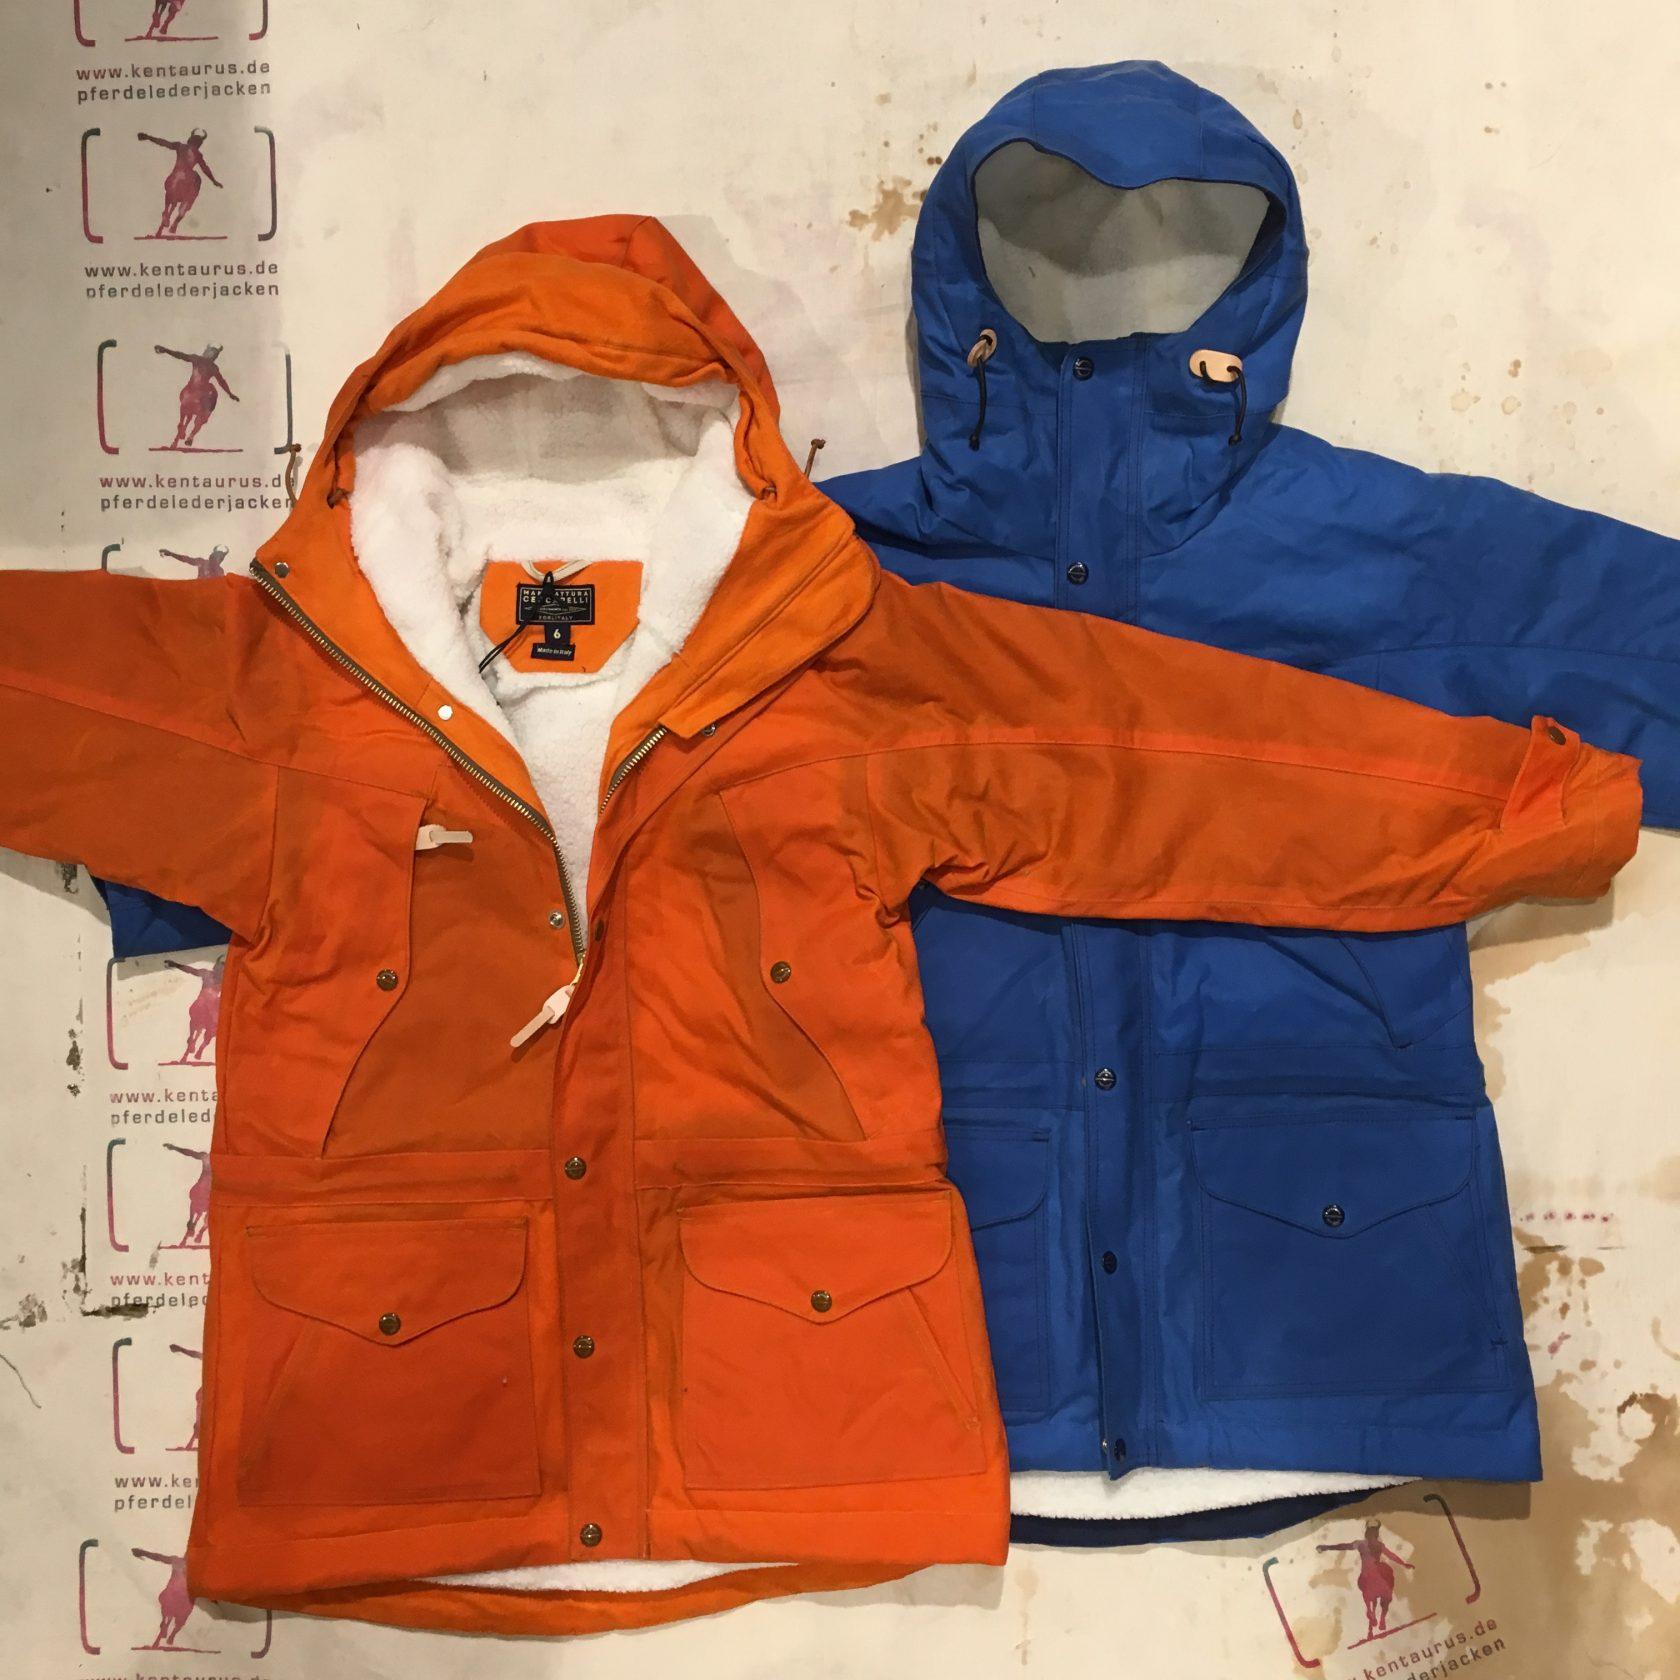 Ceccarelli AW16 Mountain Jacket orange und hellblau